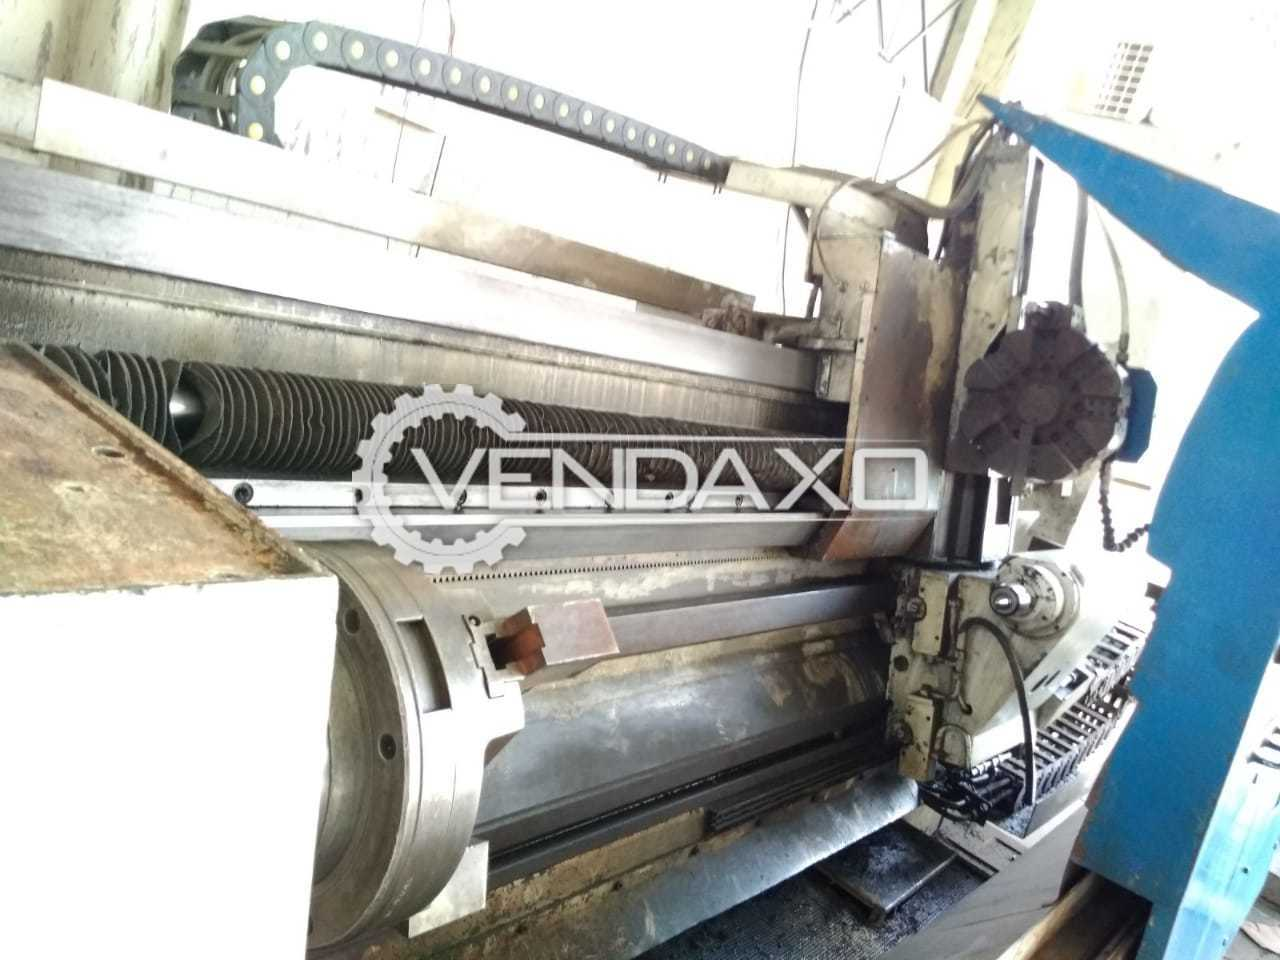 WMW CNC Lathe Machine - 2 Meter x 600 mm